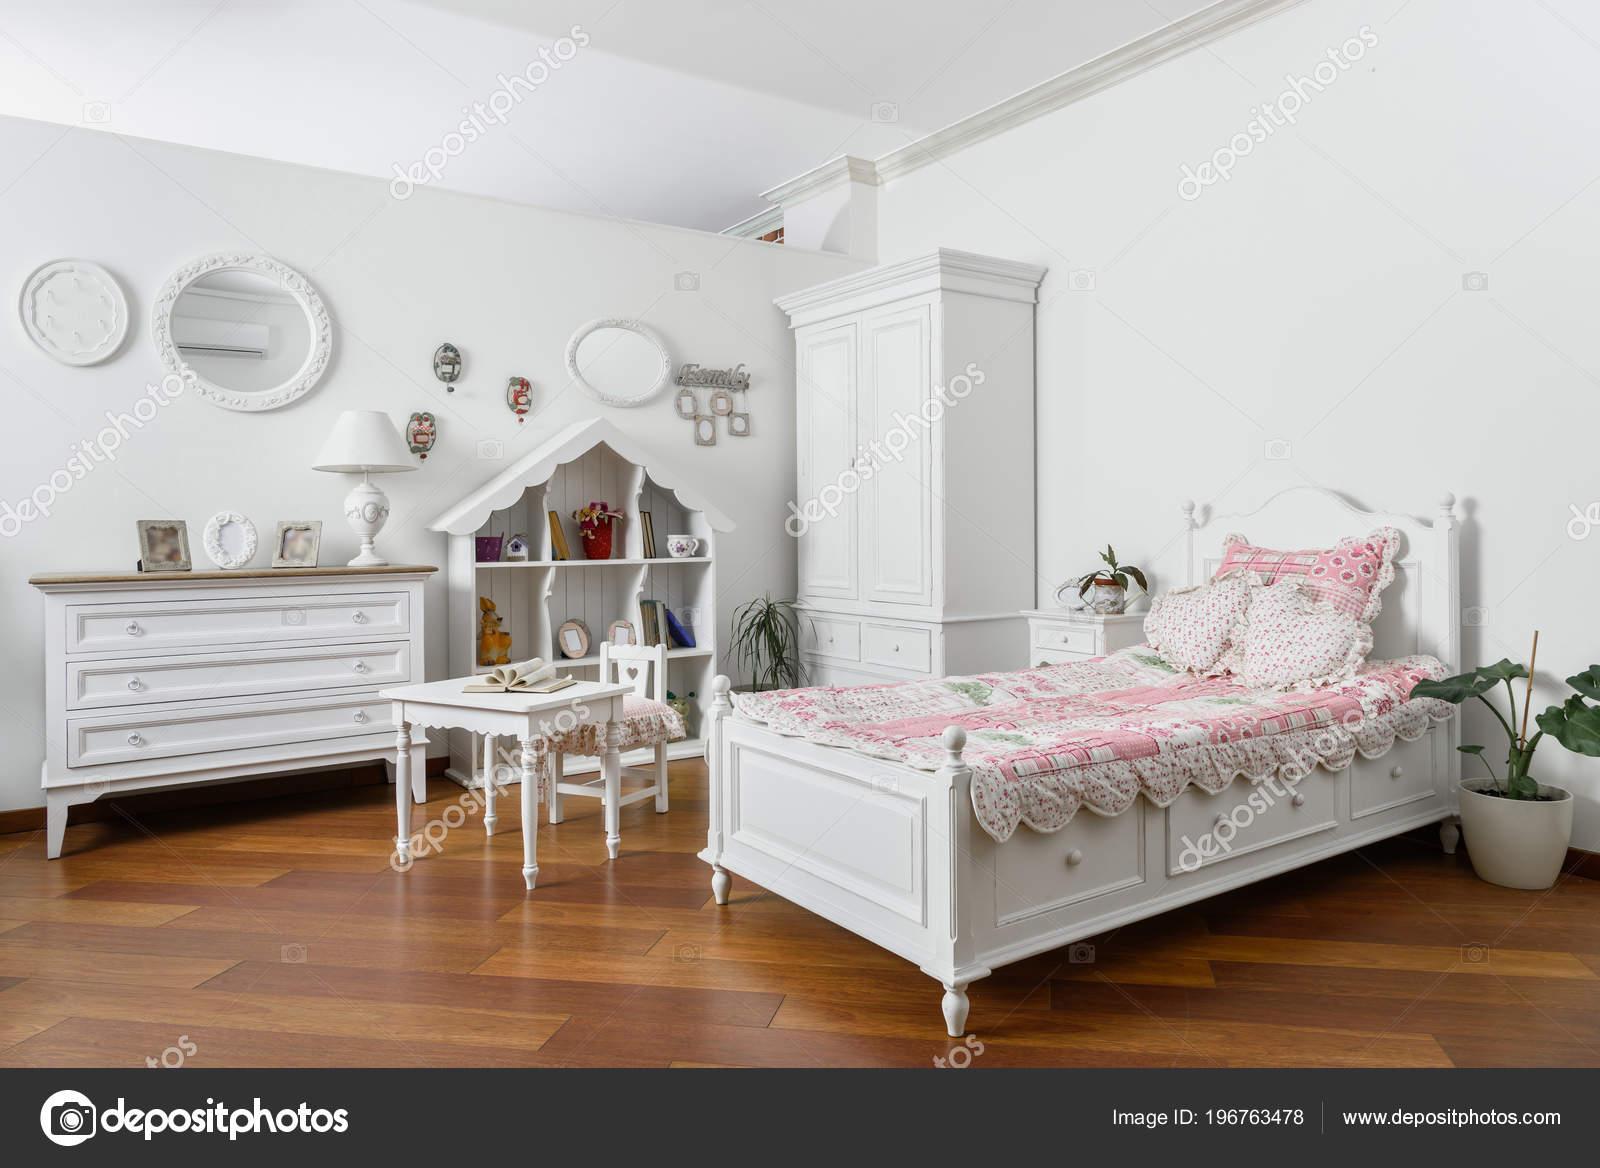 Witte Slaapkamer Meubels : Interieur van moderne lichte slaapkamer met smalle witte meubels